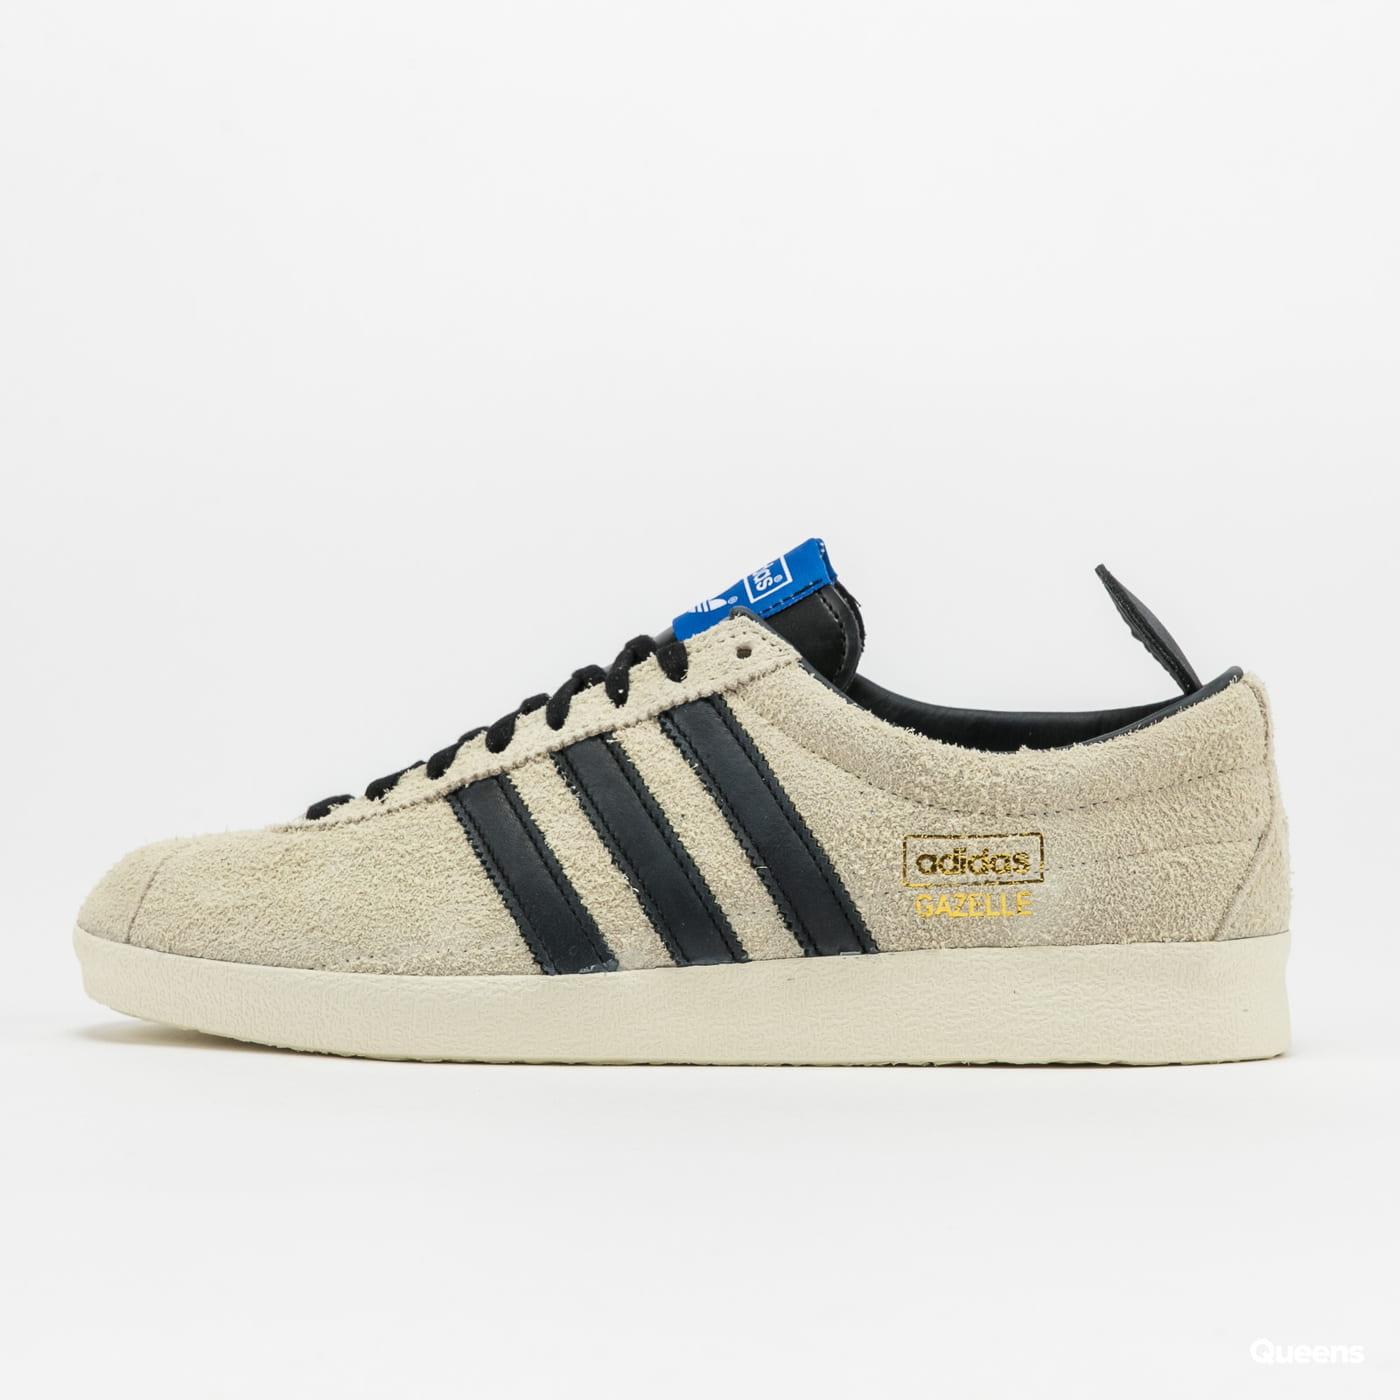 adidas Originals Gazelle Vintage cwhite / cblack / blue